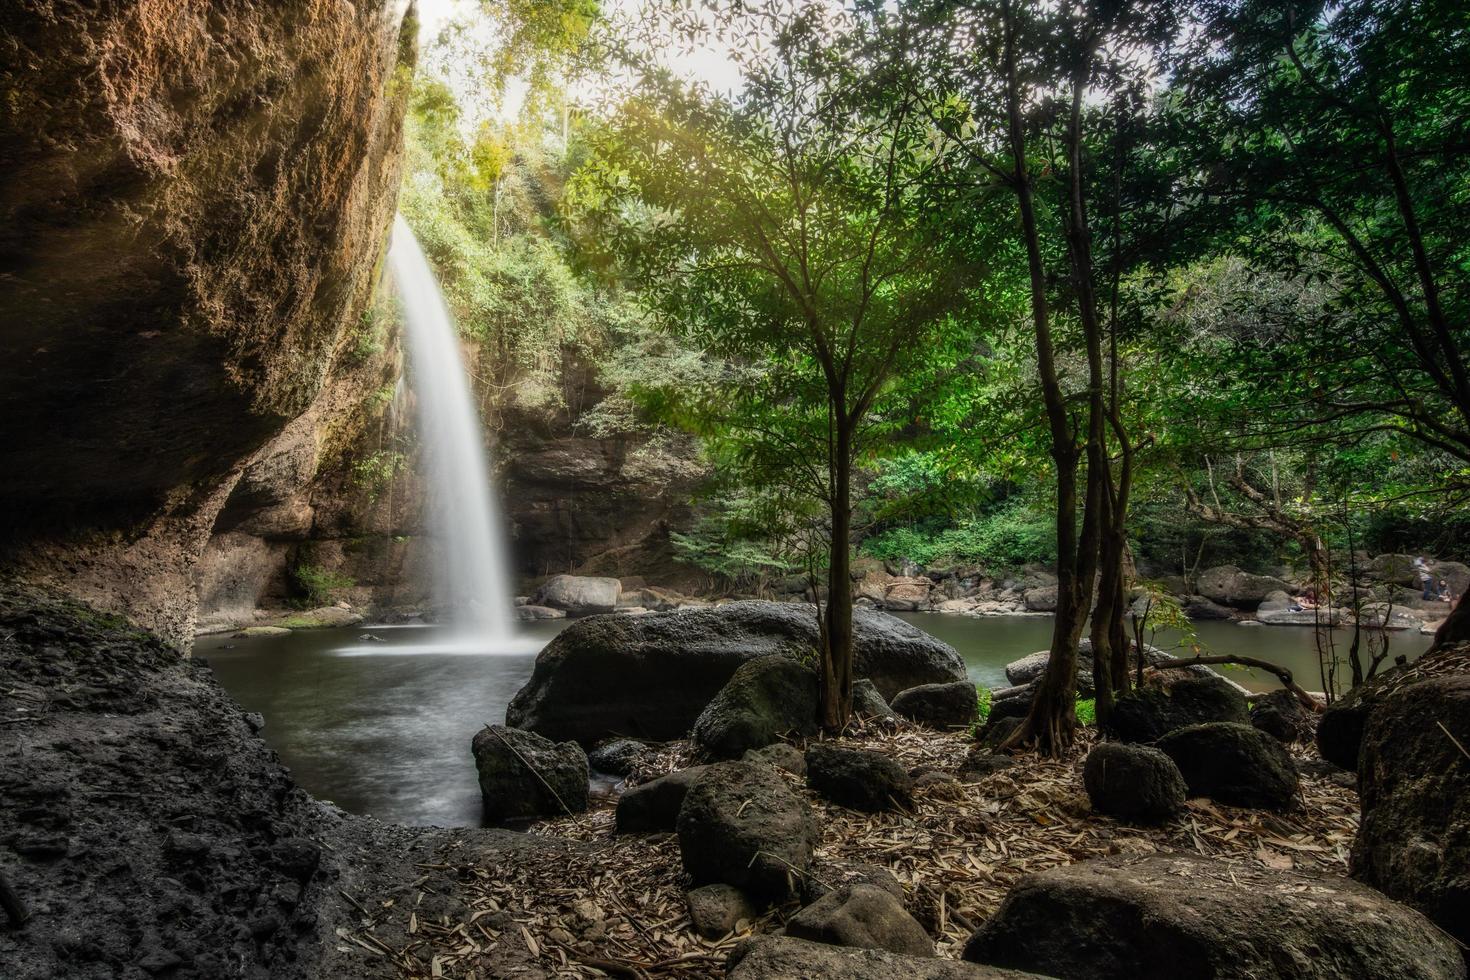 Cascade de suwat haew naturel, Thaïlande photo